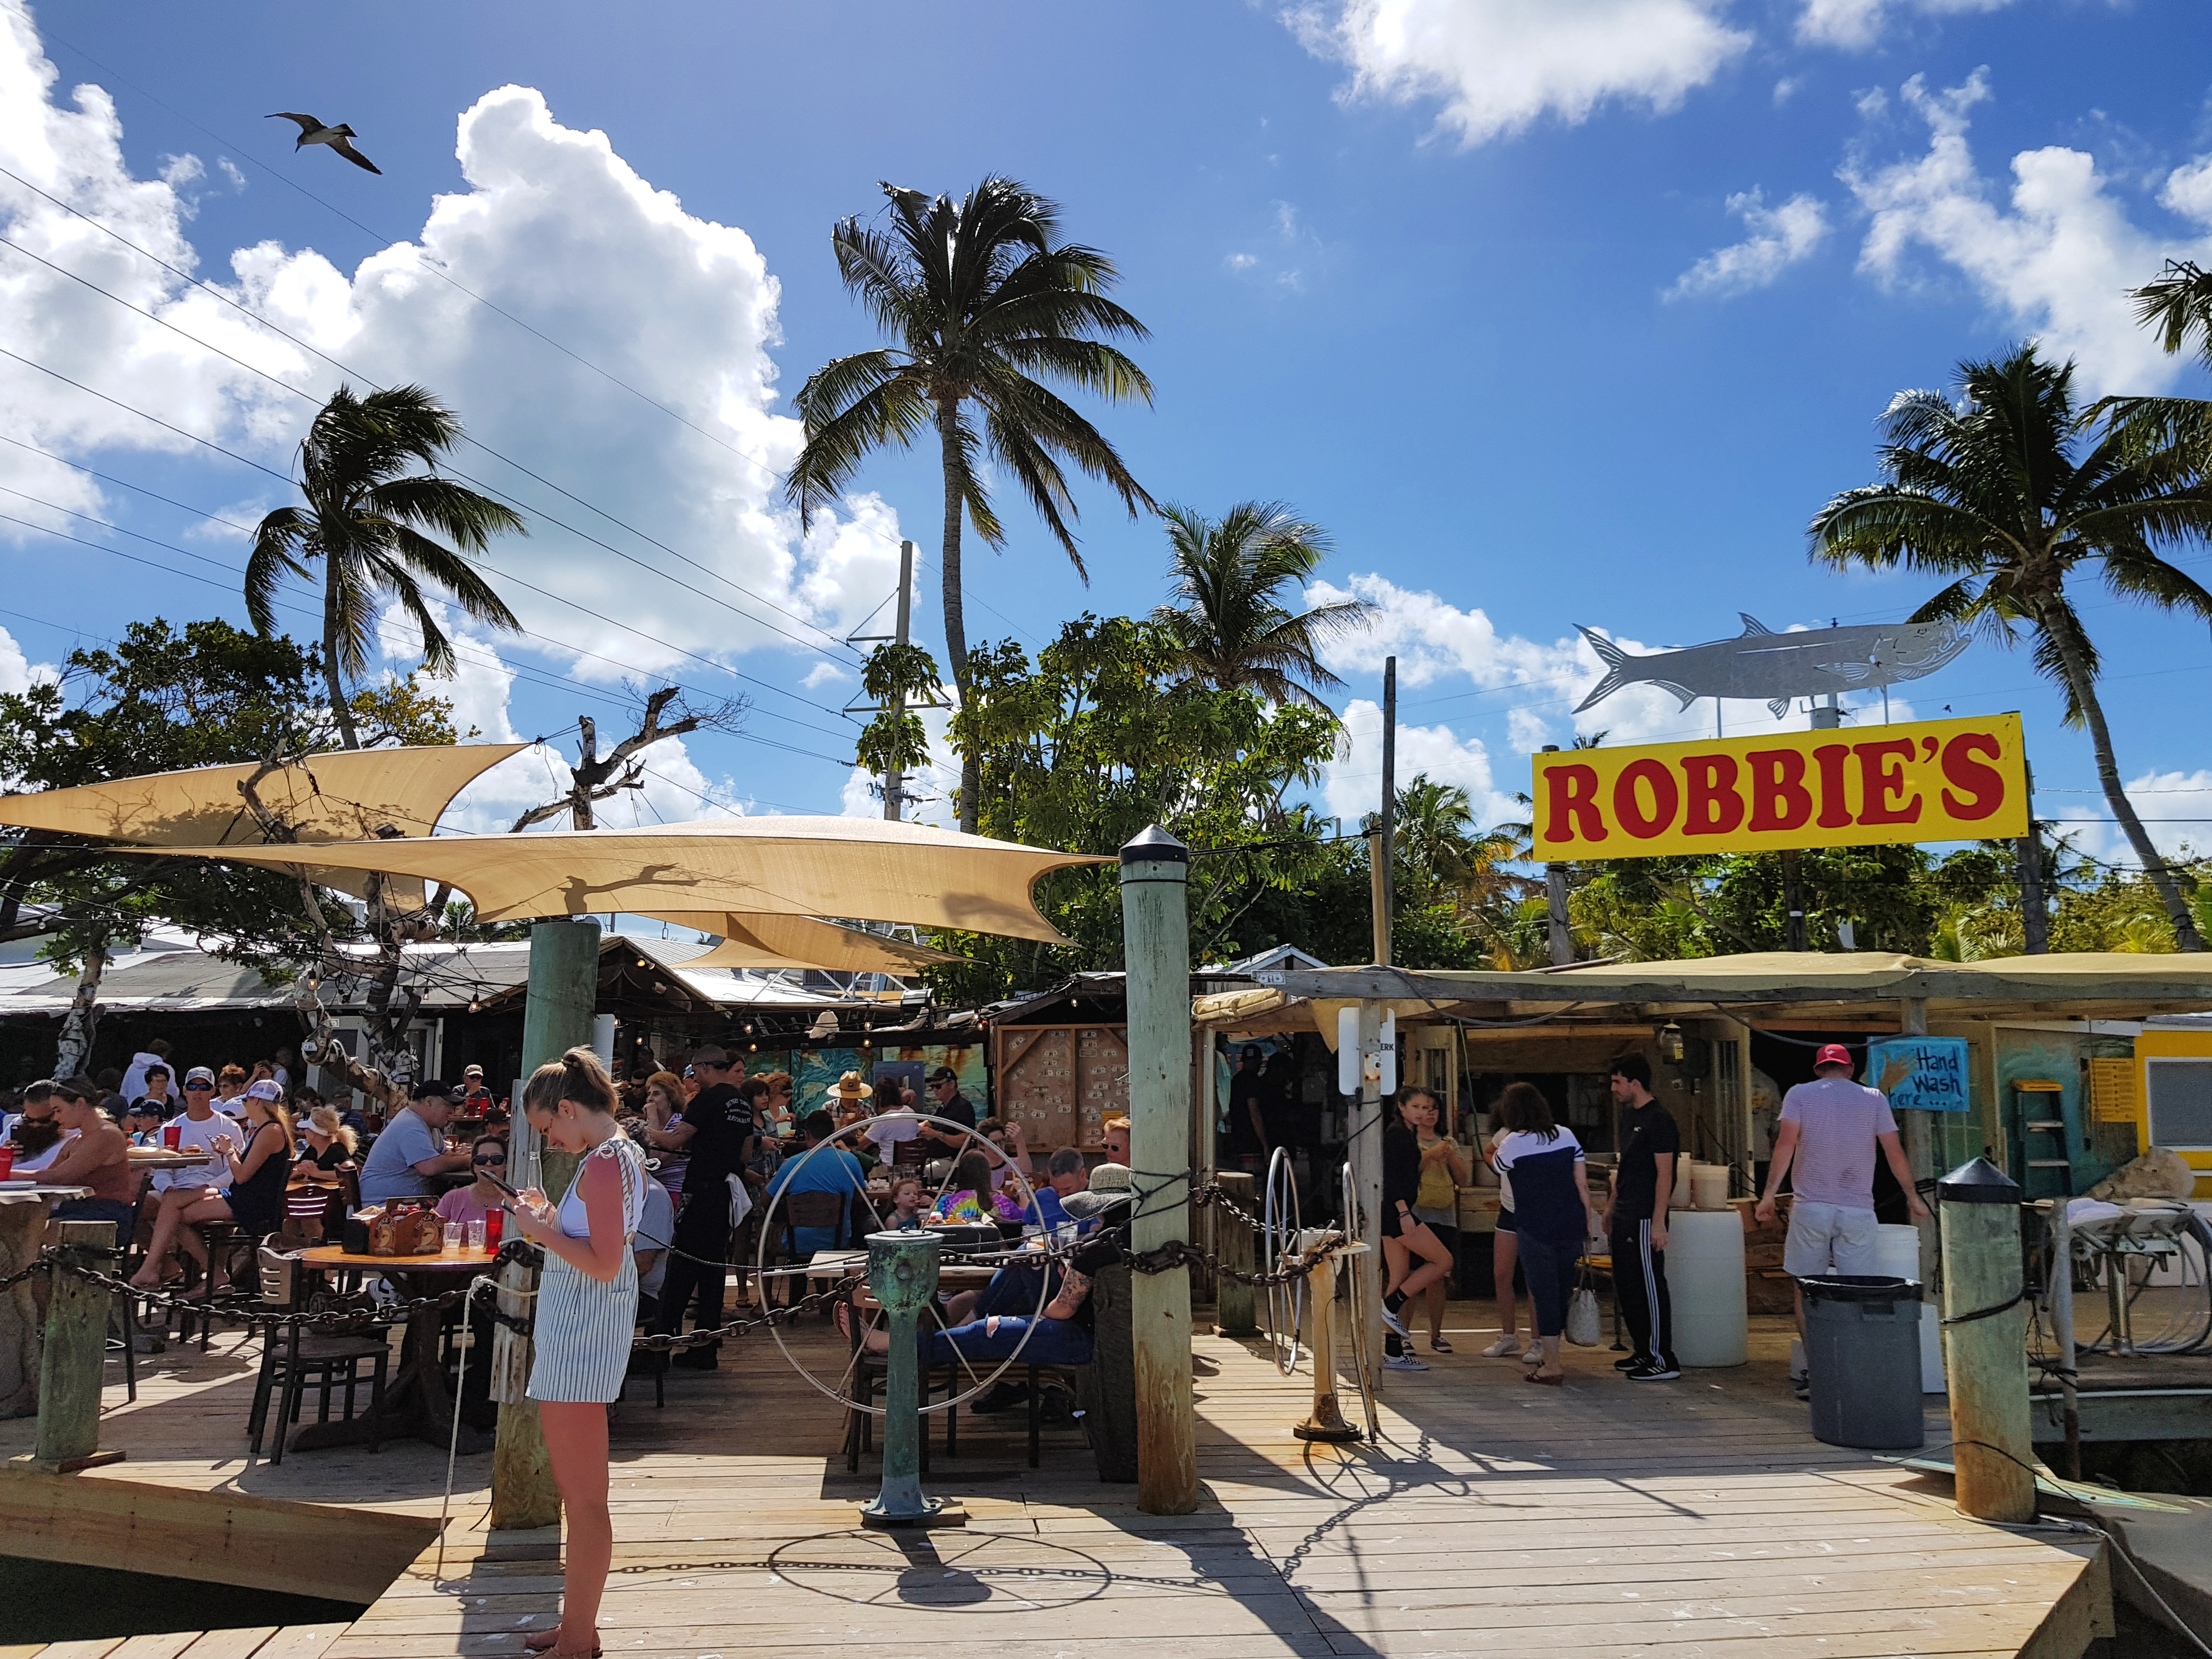 Florida Keys Robbie's reisblog